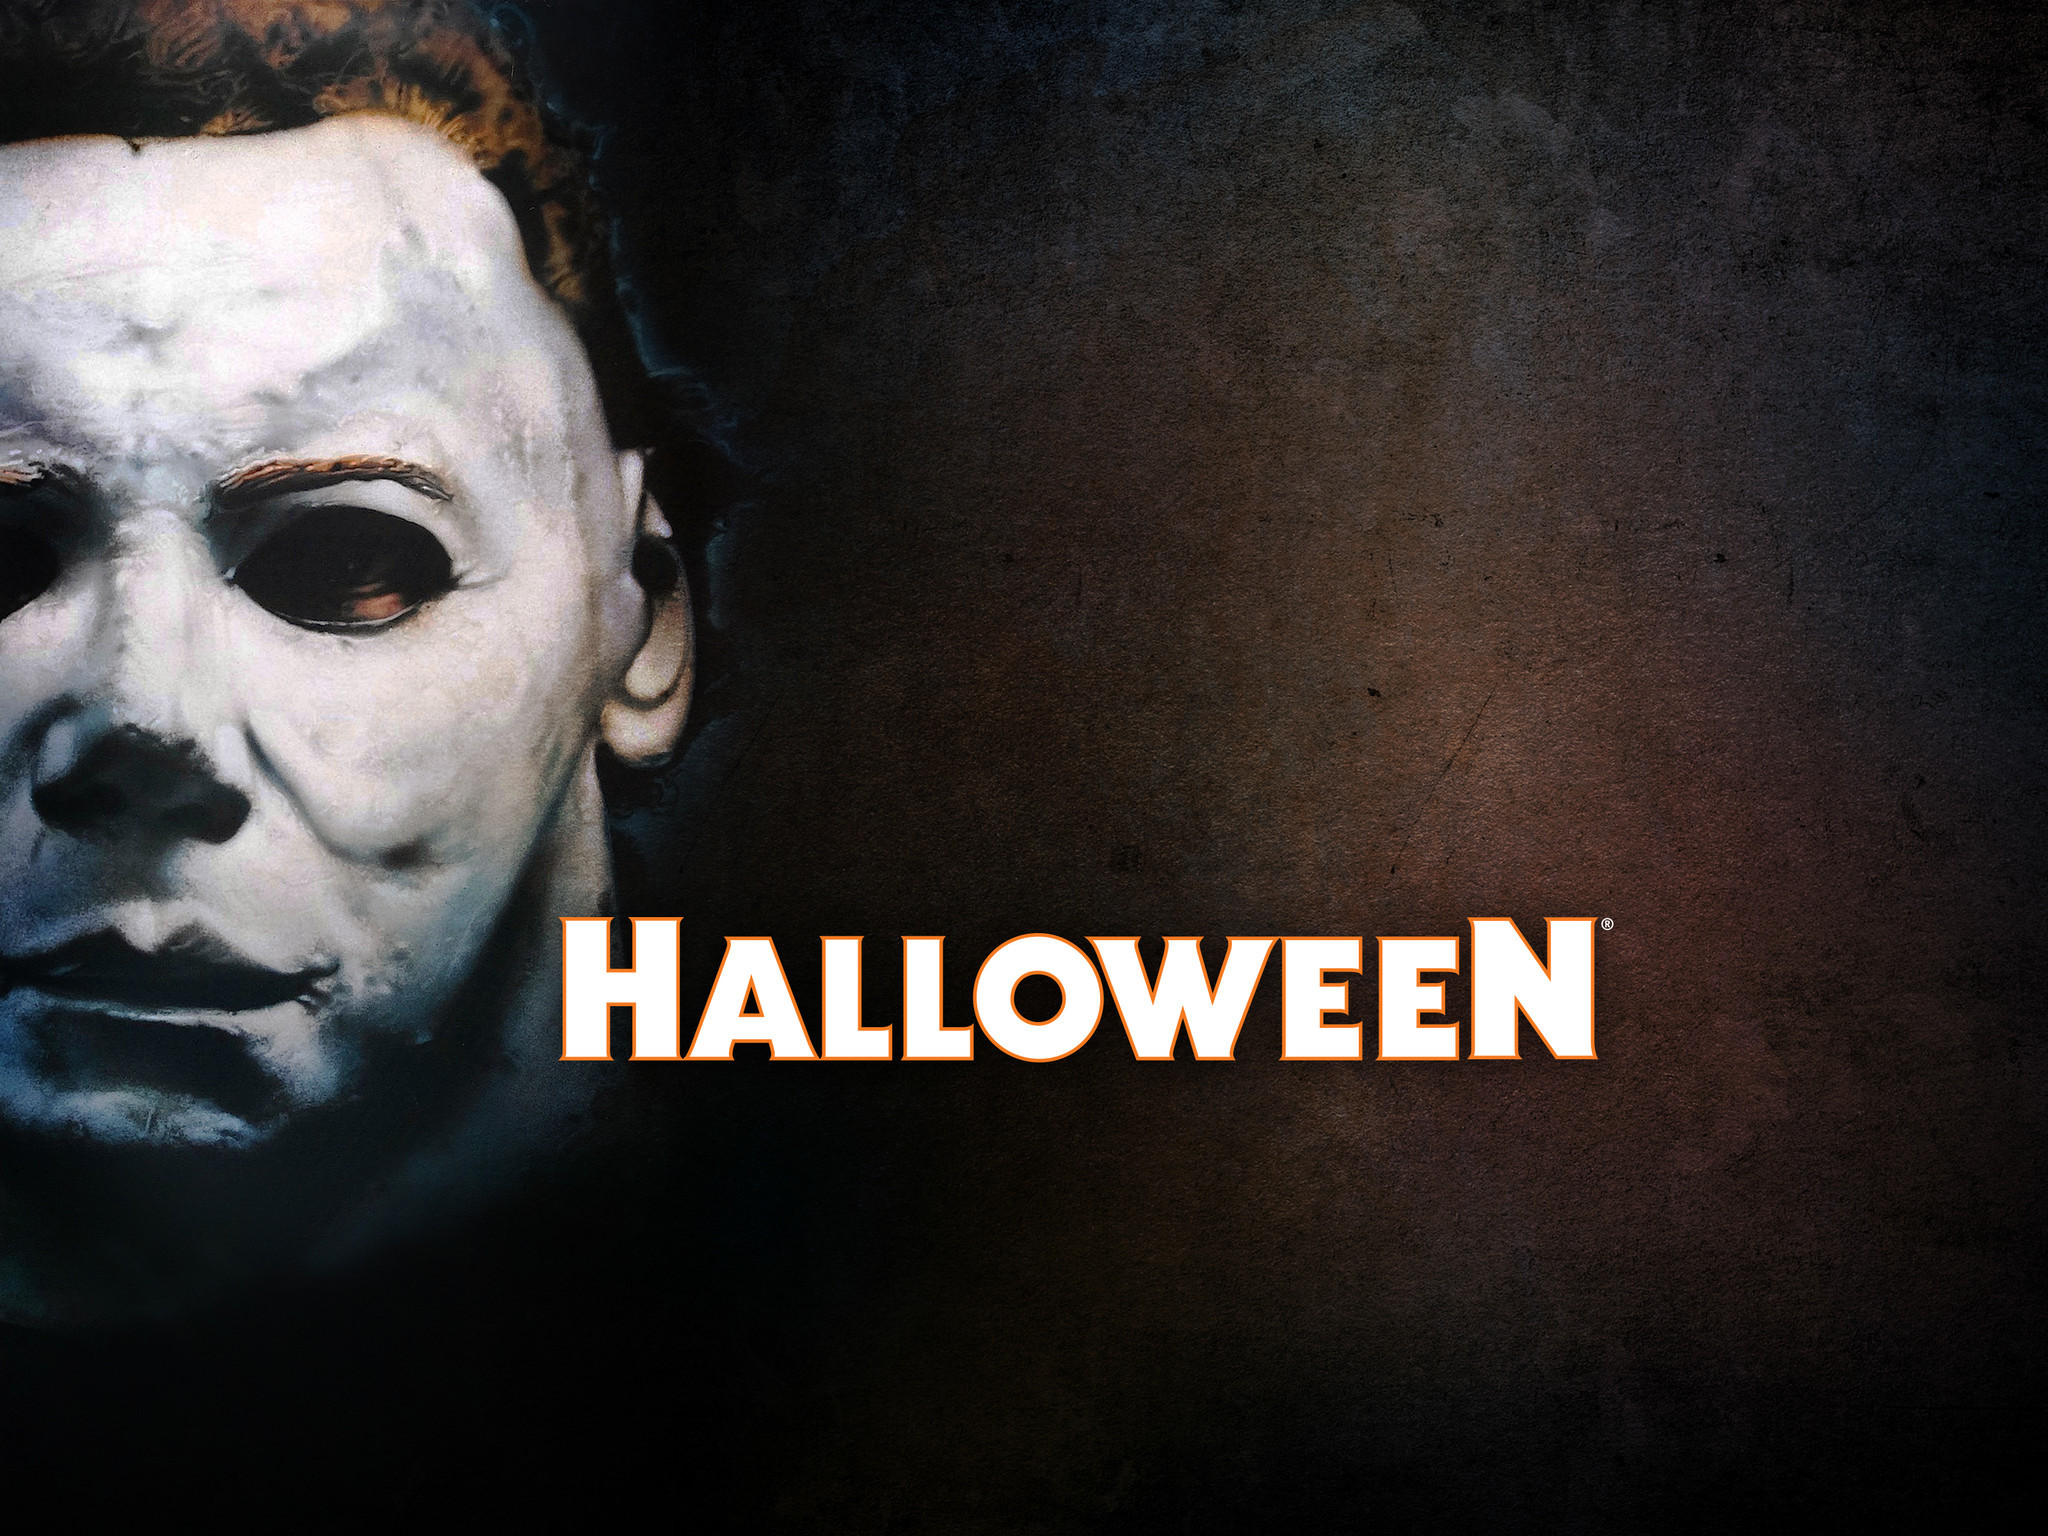 O Fenômeno Halloween e a Mitologia de Michael Myers